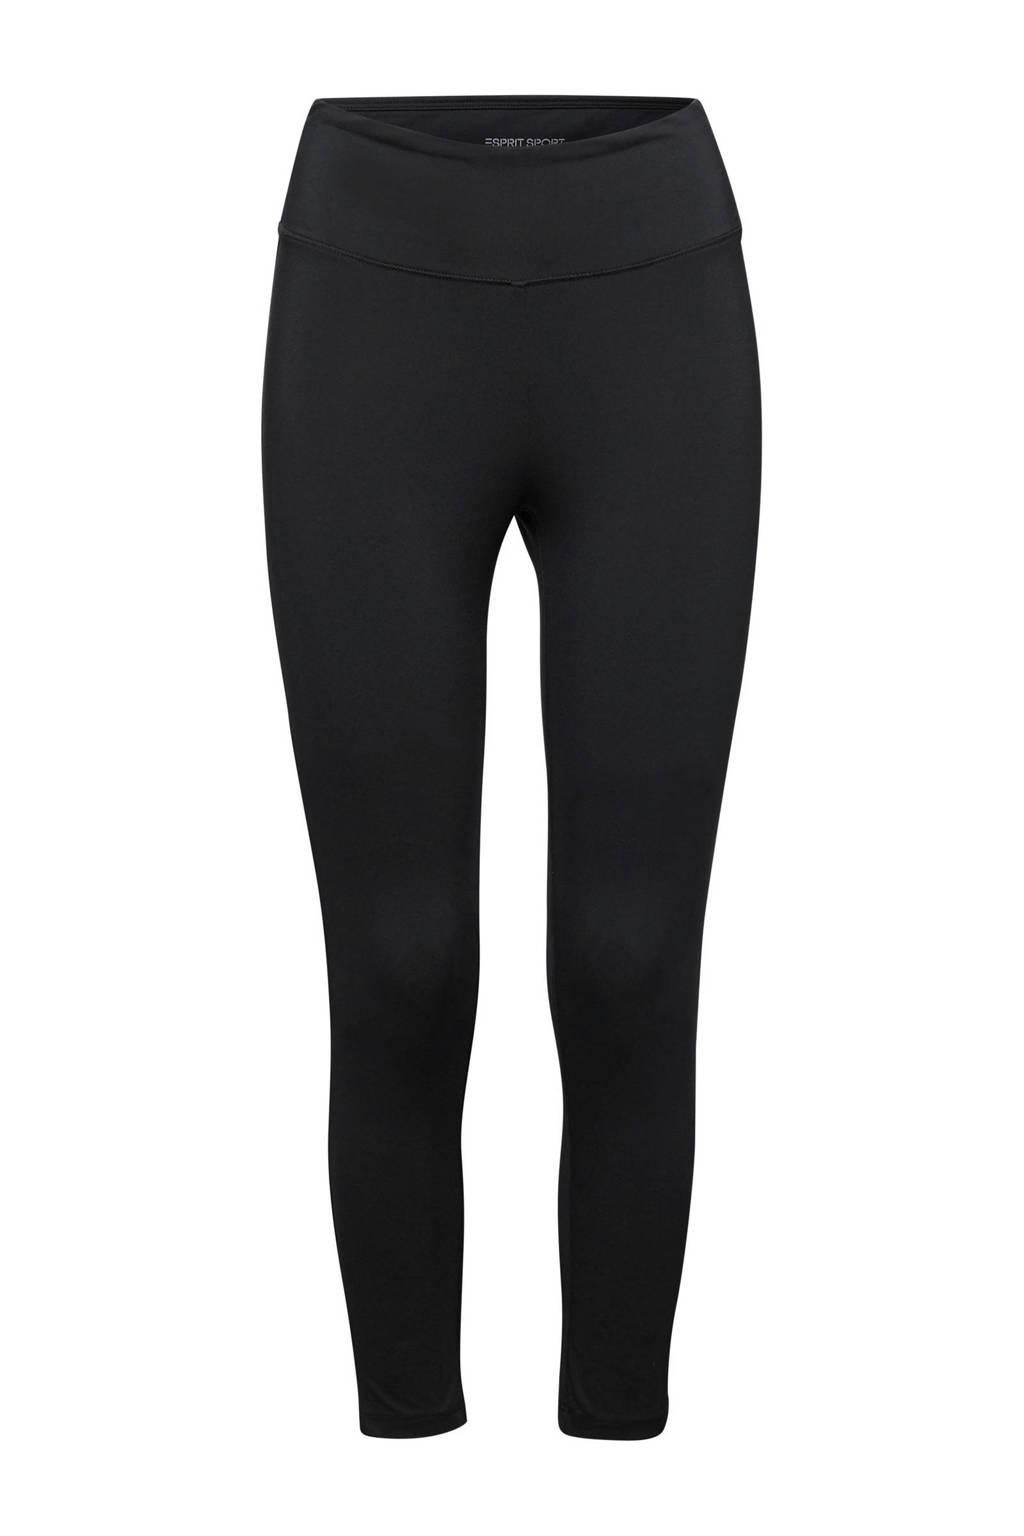 ESPRIT Women Sports sportbroek zwart, Zwart